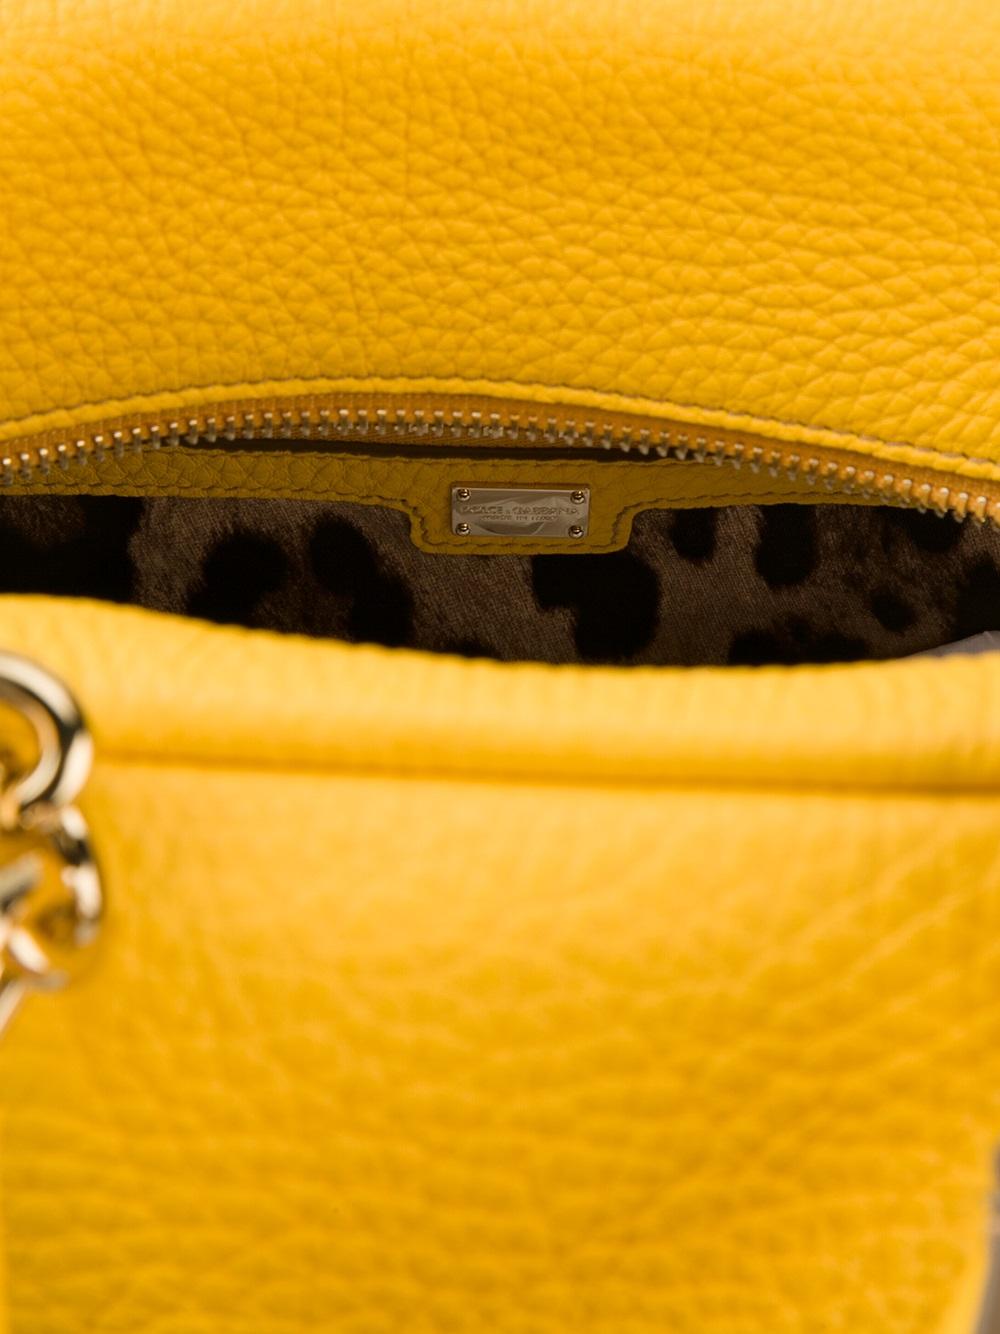 Dolce & Gabbana Doctors Bag Tote in Yellow & Orange (Yellow)